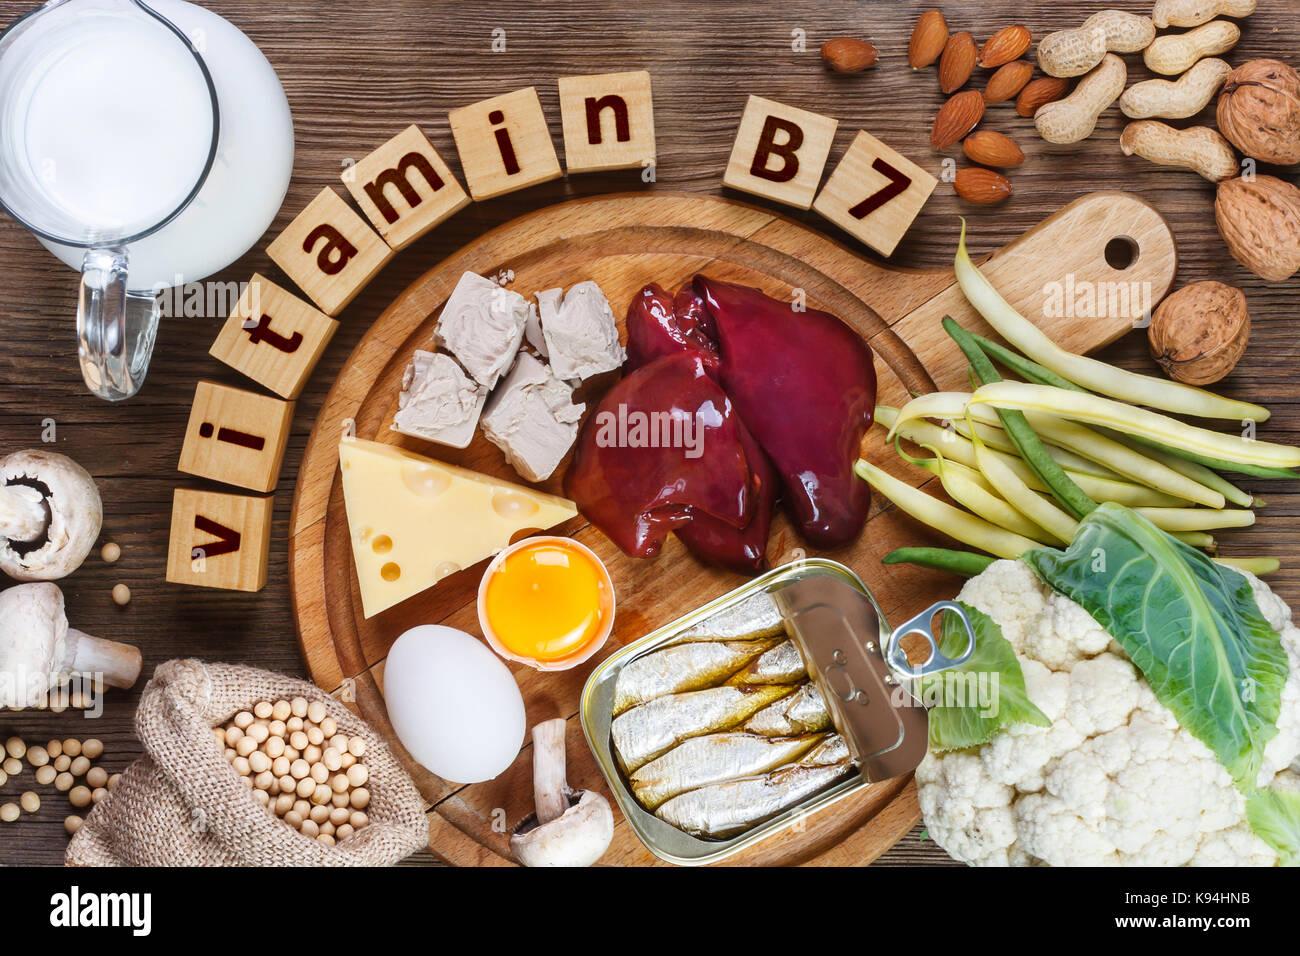 Foods rich in vitamin B7 (Biotin). Foods as liver, eggs yolk, yeast, cheese, sardines, soybeans, milk, cauliflower, - Stock Image